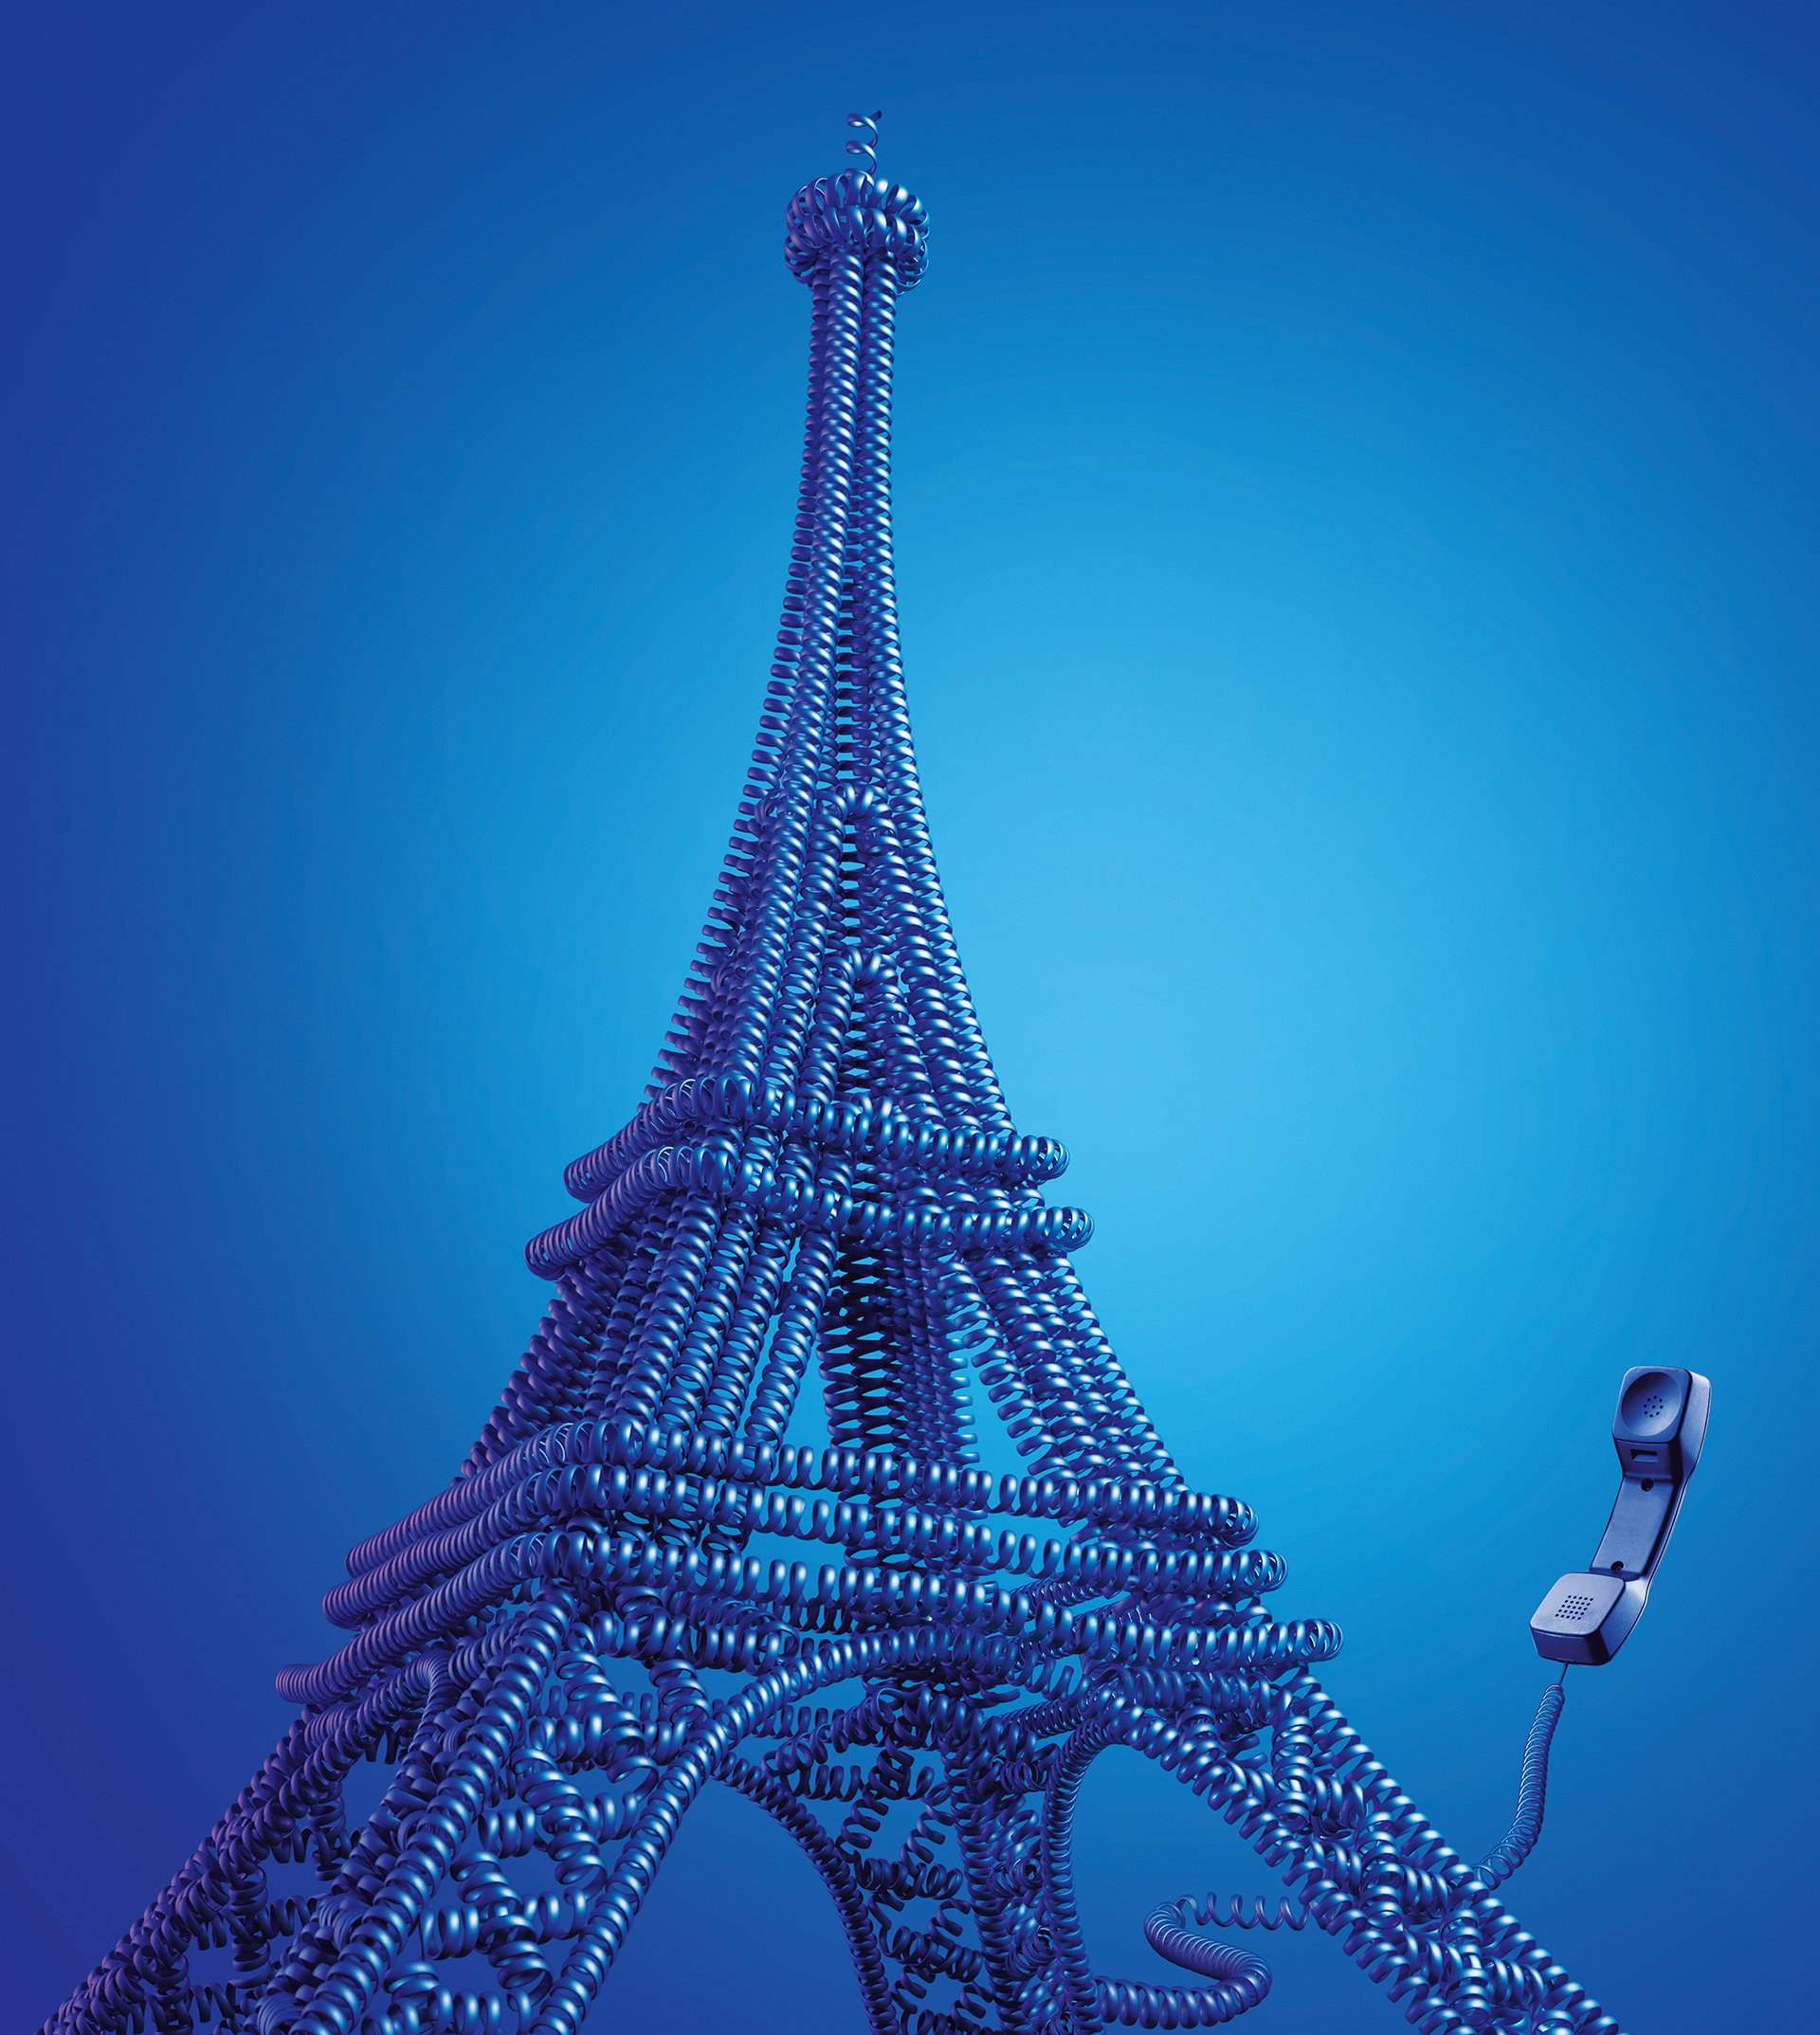 021a-Handline_Eiffel Tower